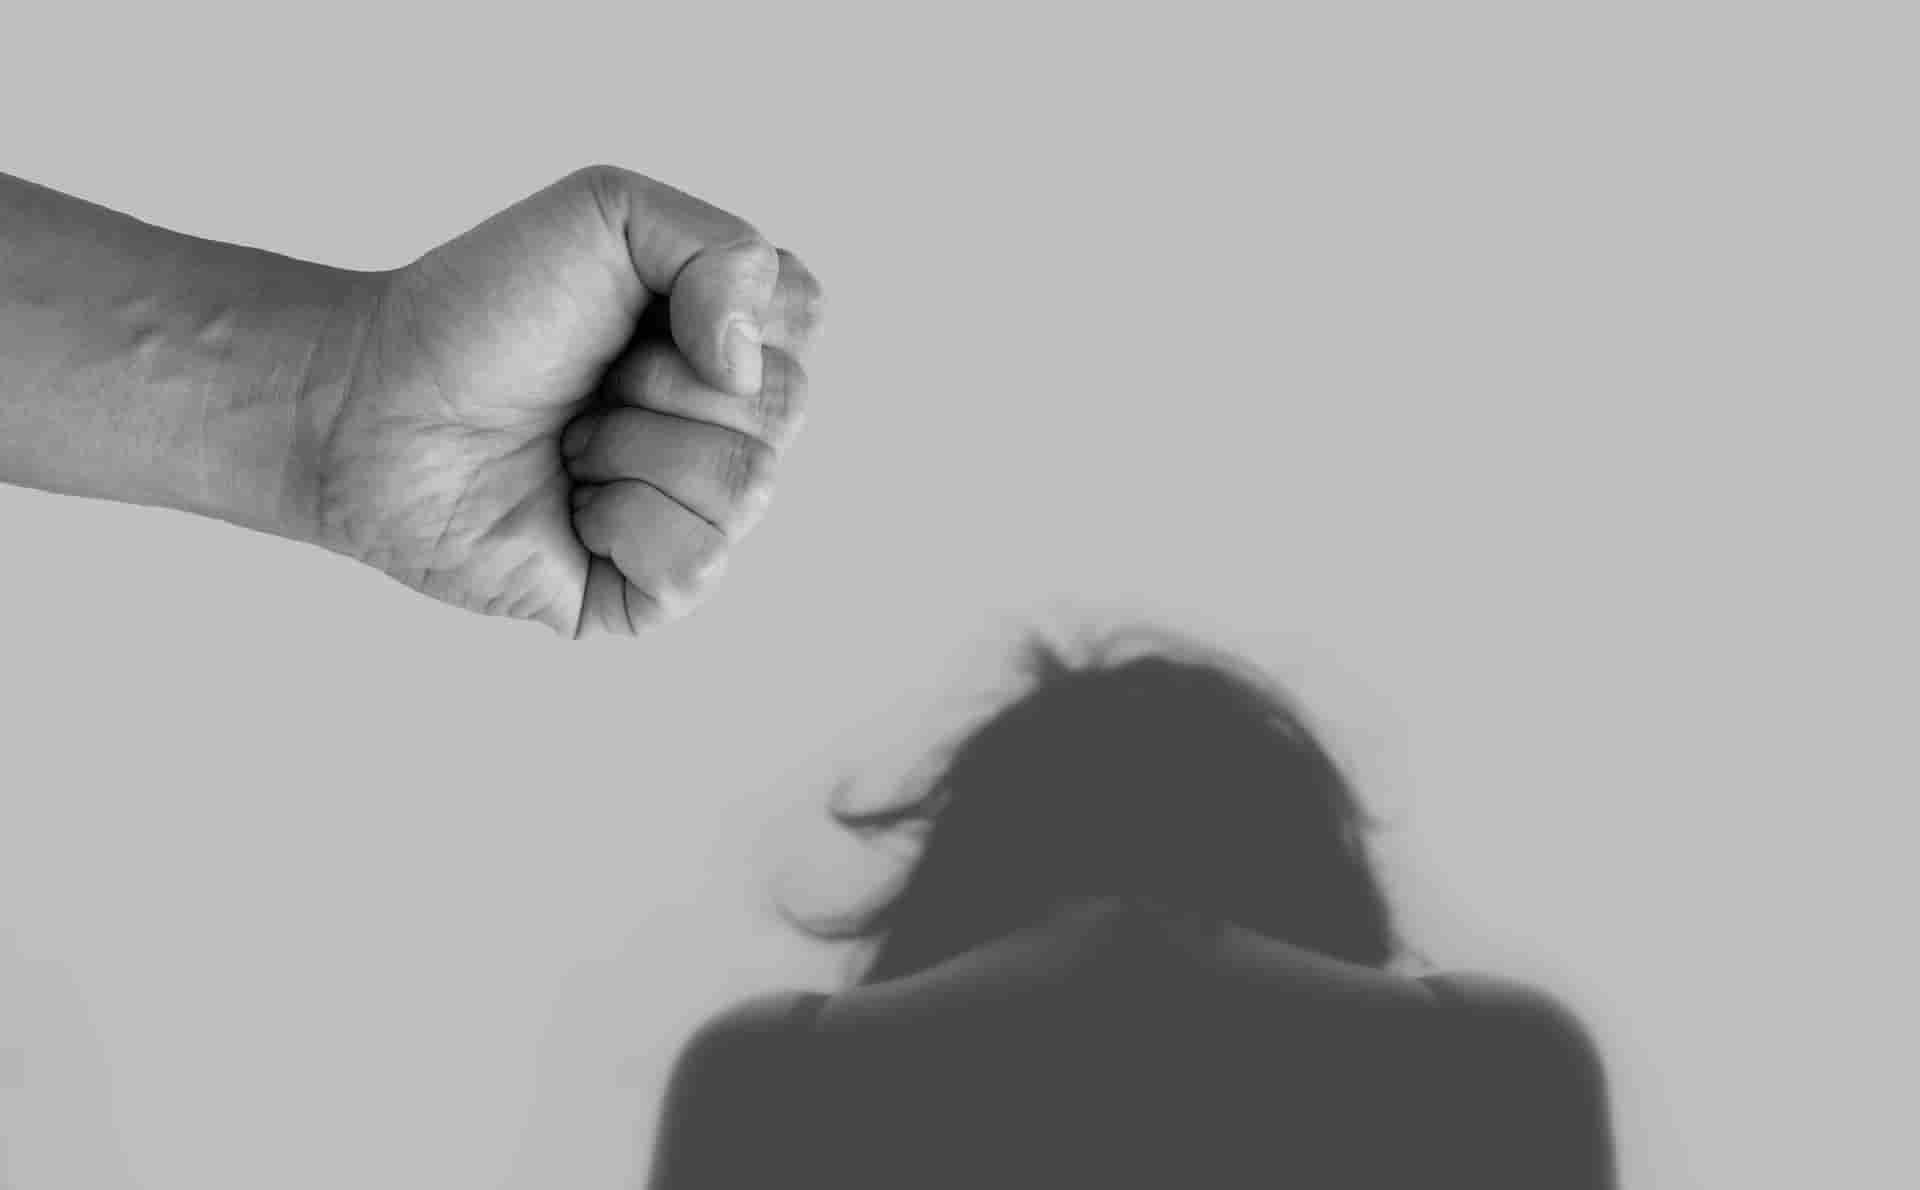 violencia machista contra la mujer